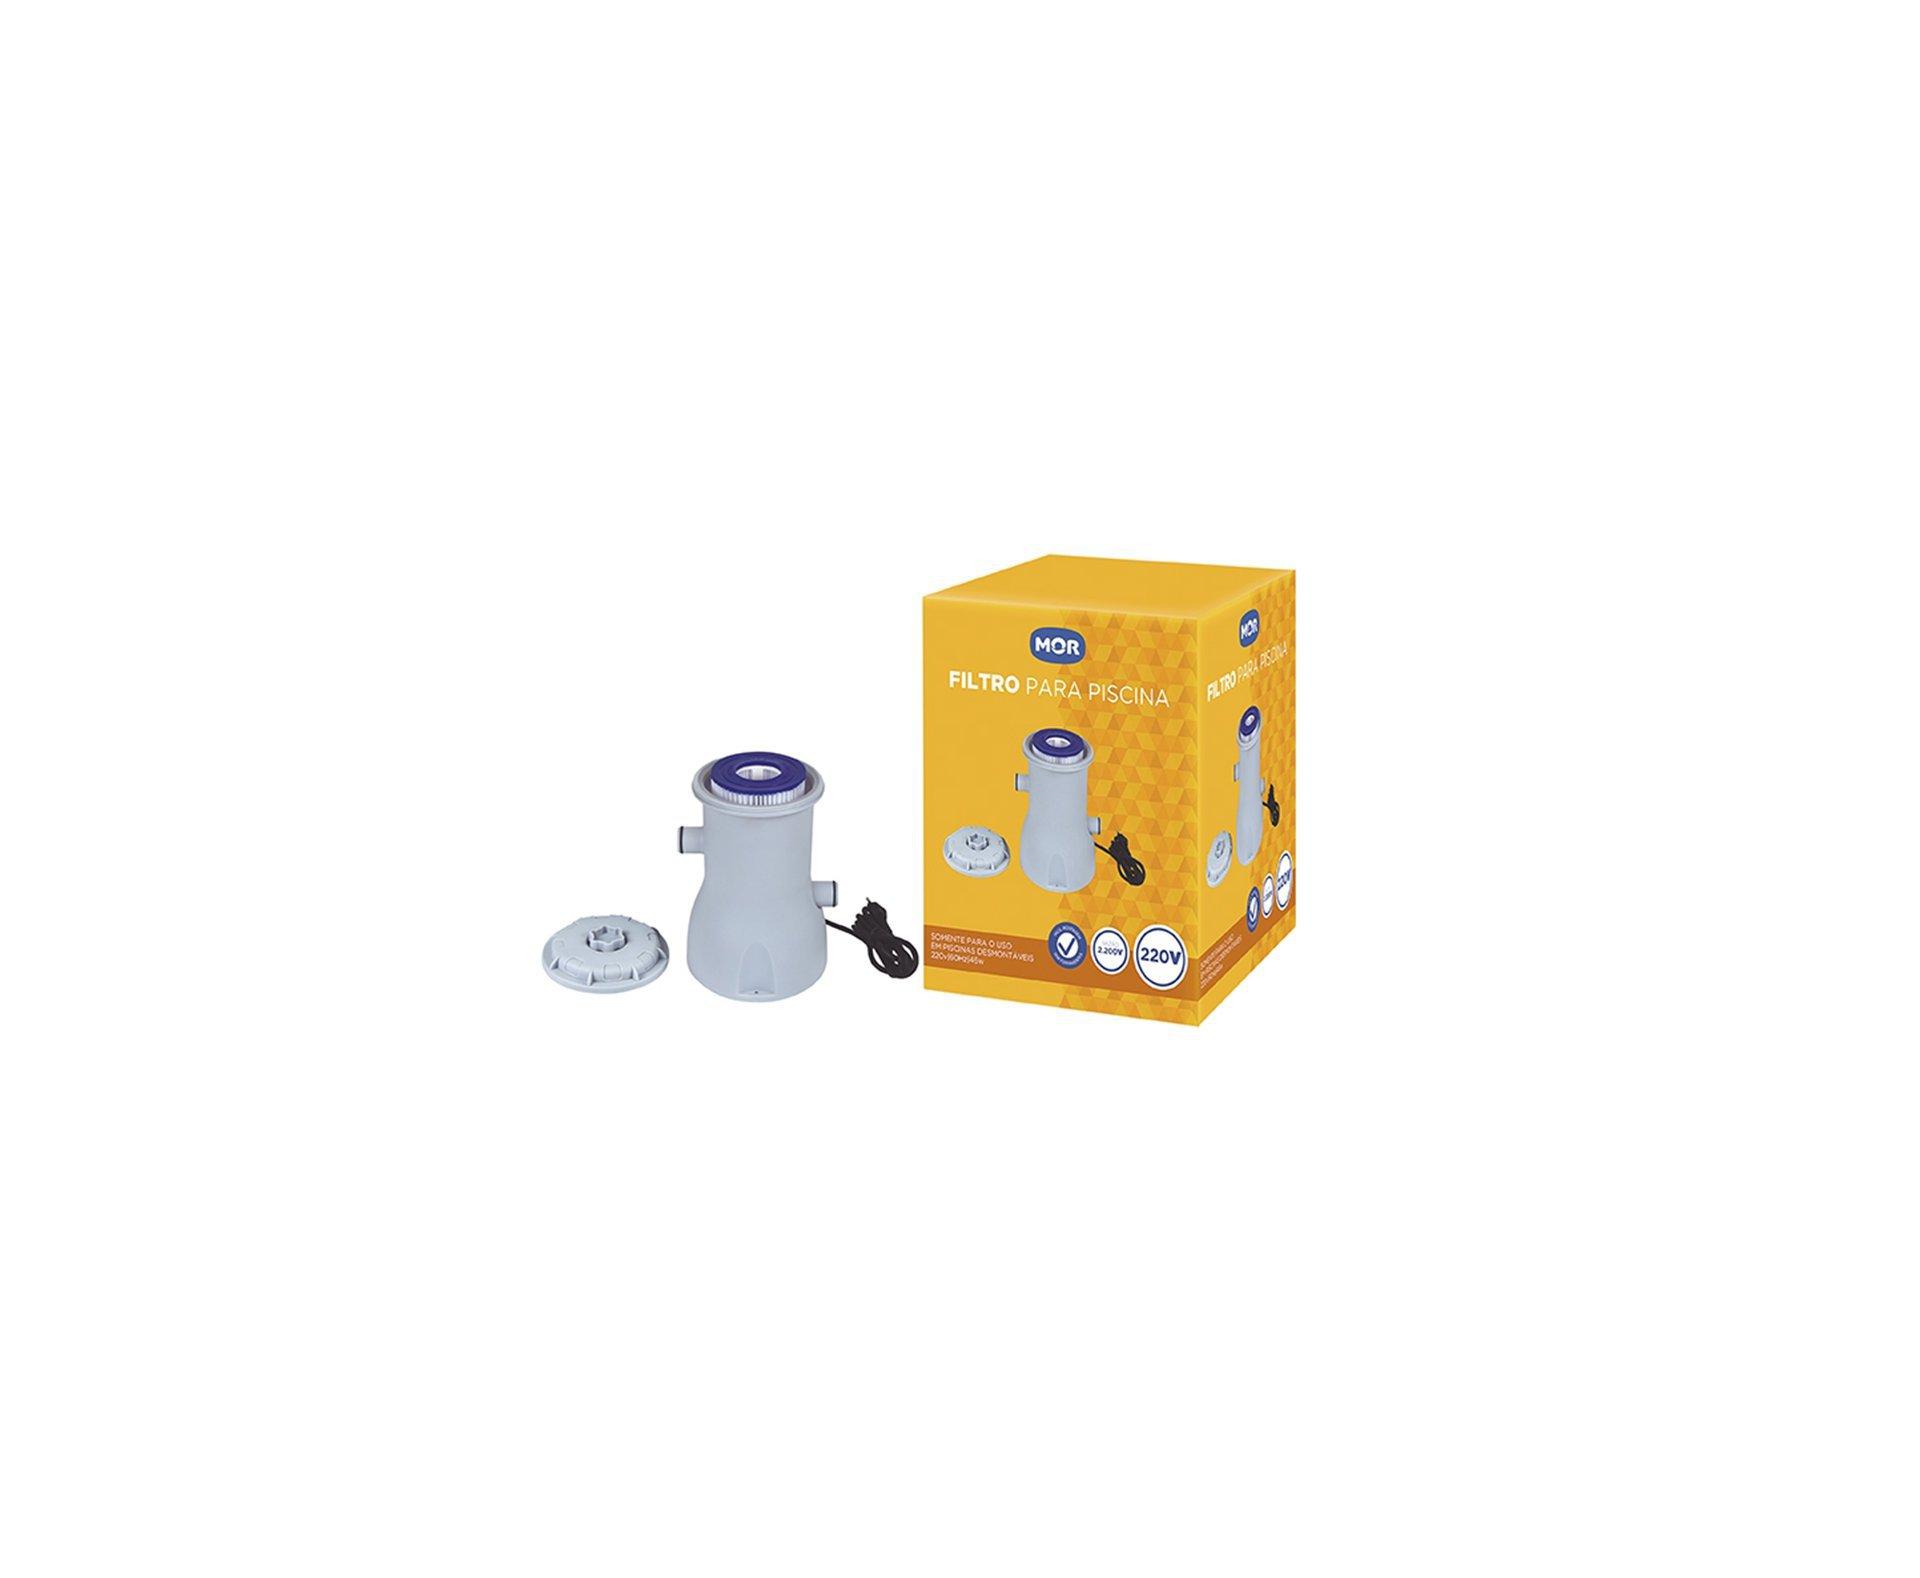 Filtro Para Piscina - Capacidade 2200l/h - 110v - Mor